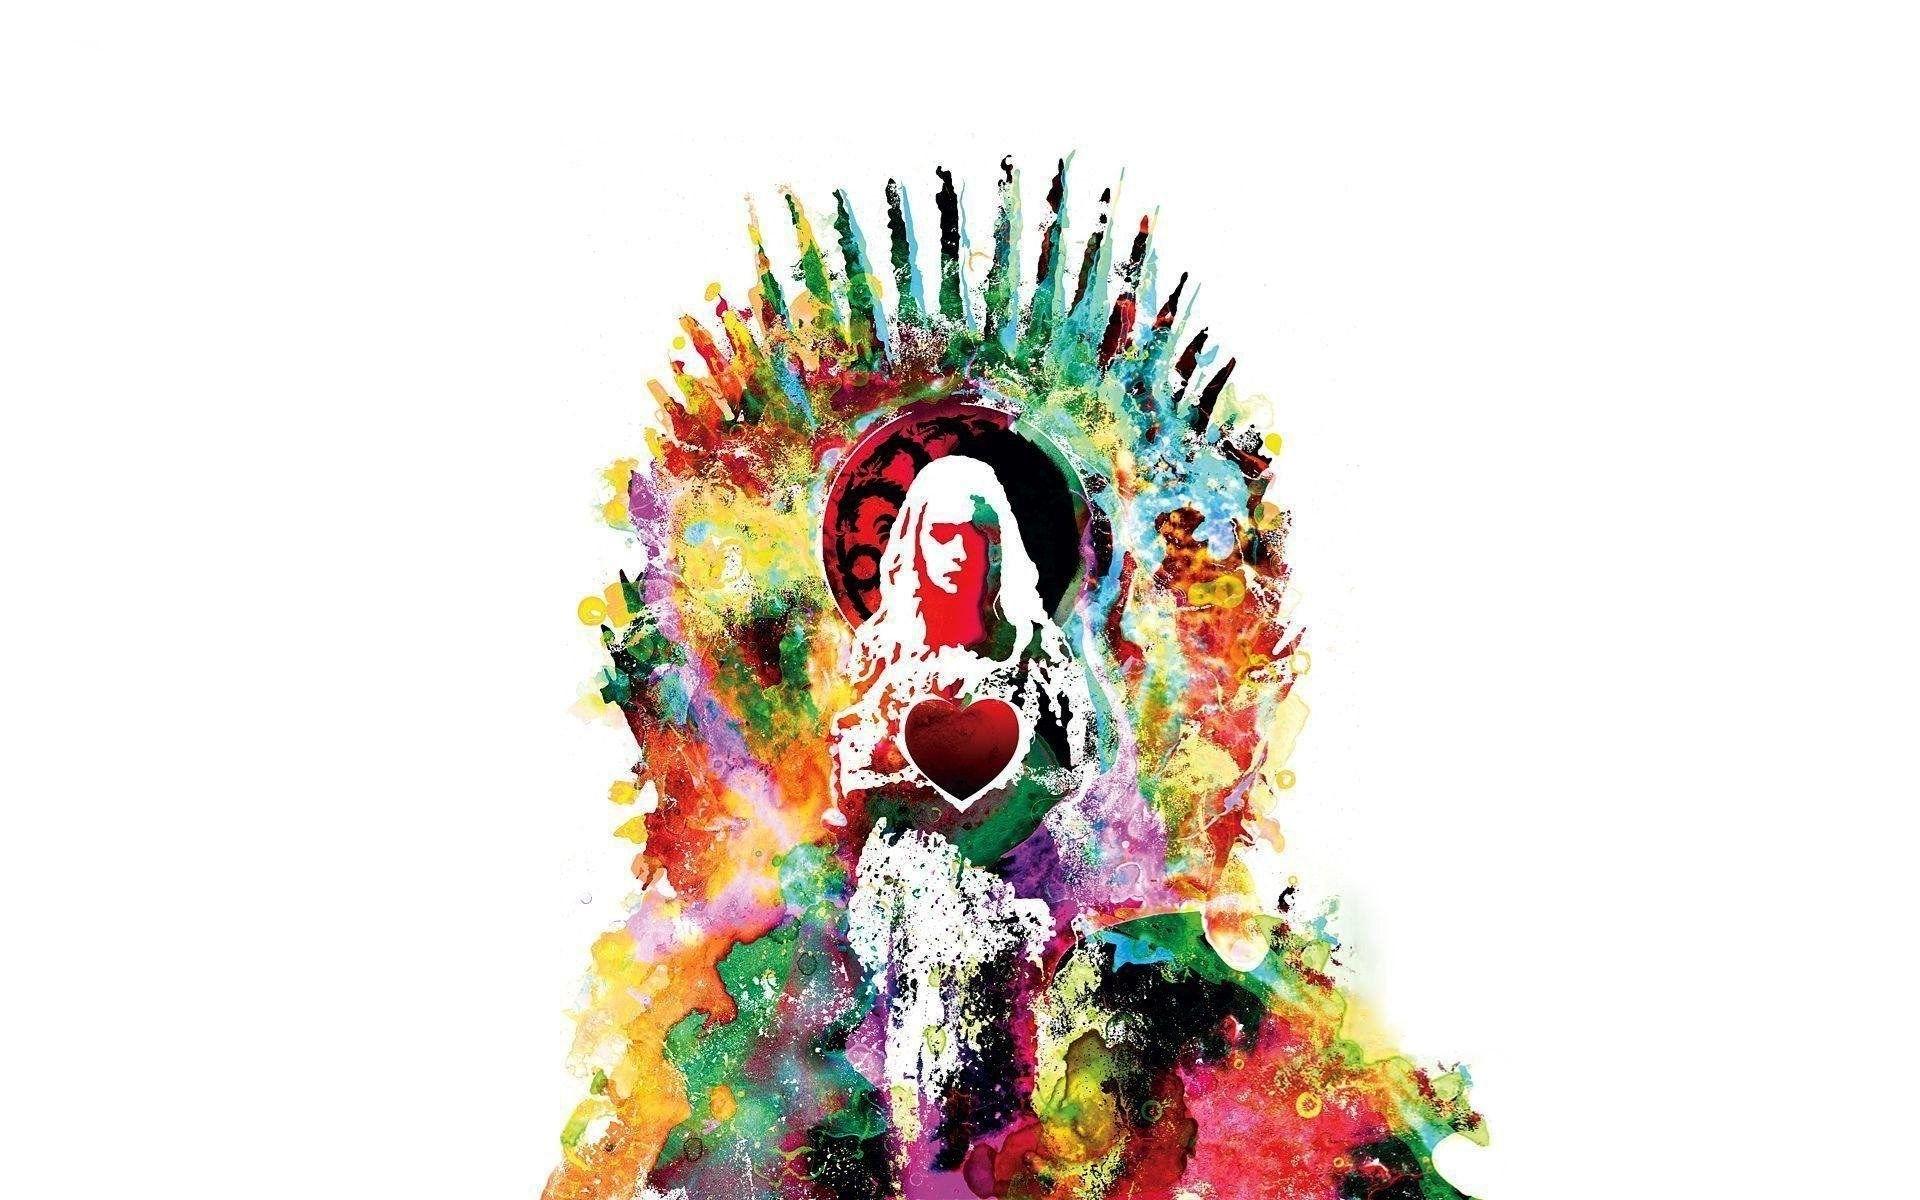 Daenerys Targaryen colorful fan art